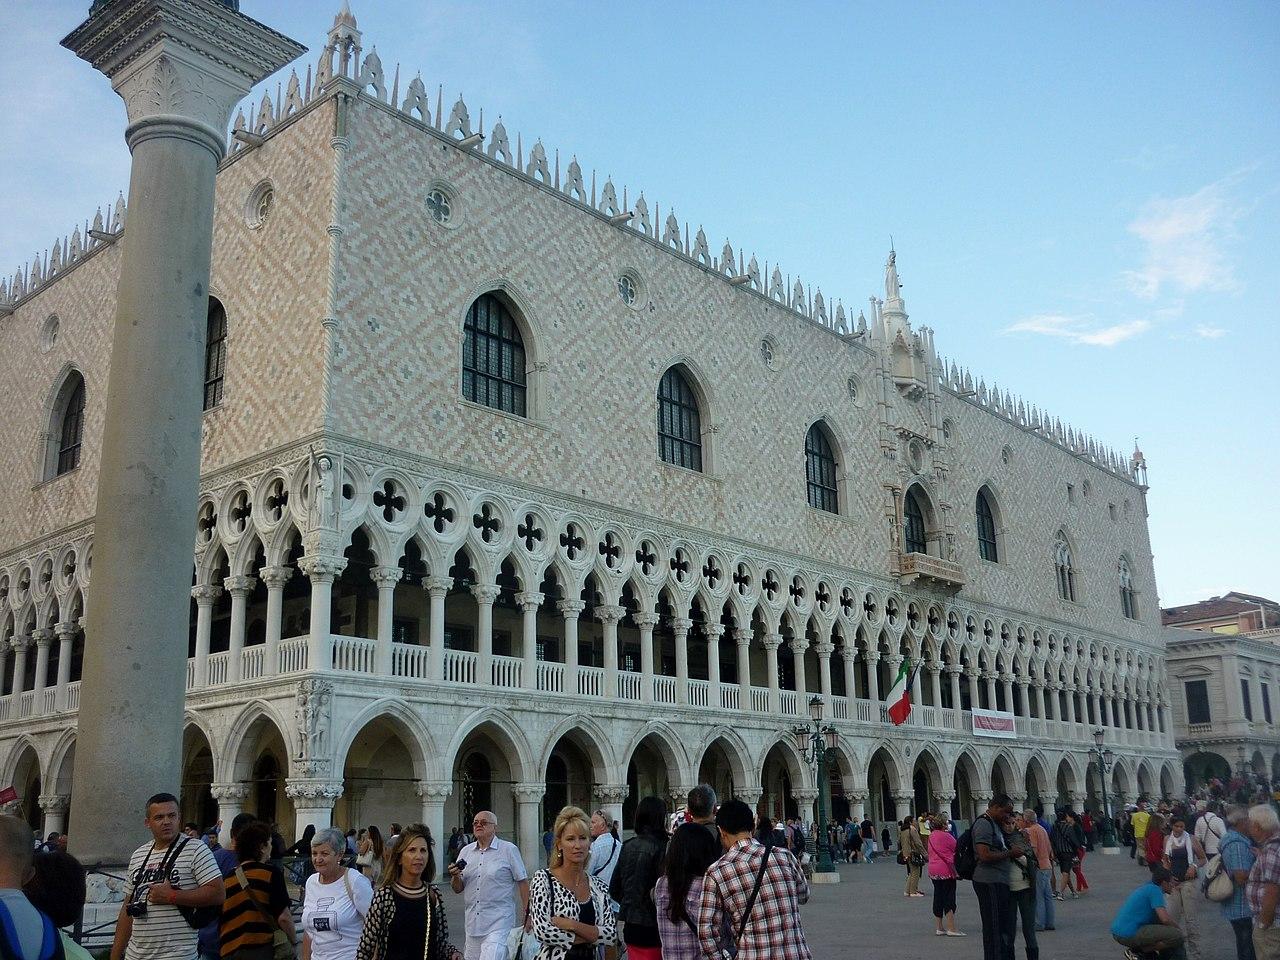 1280px-Dogenpalast_Venedig_2014.JPG